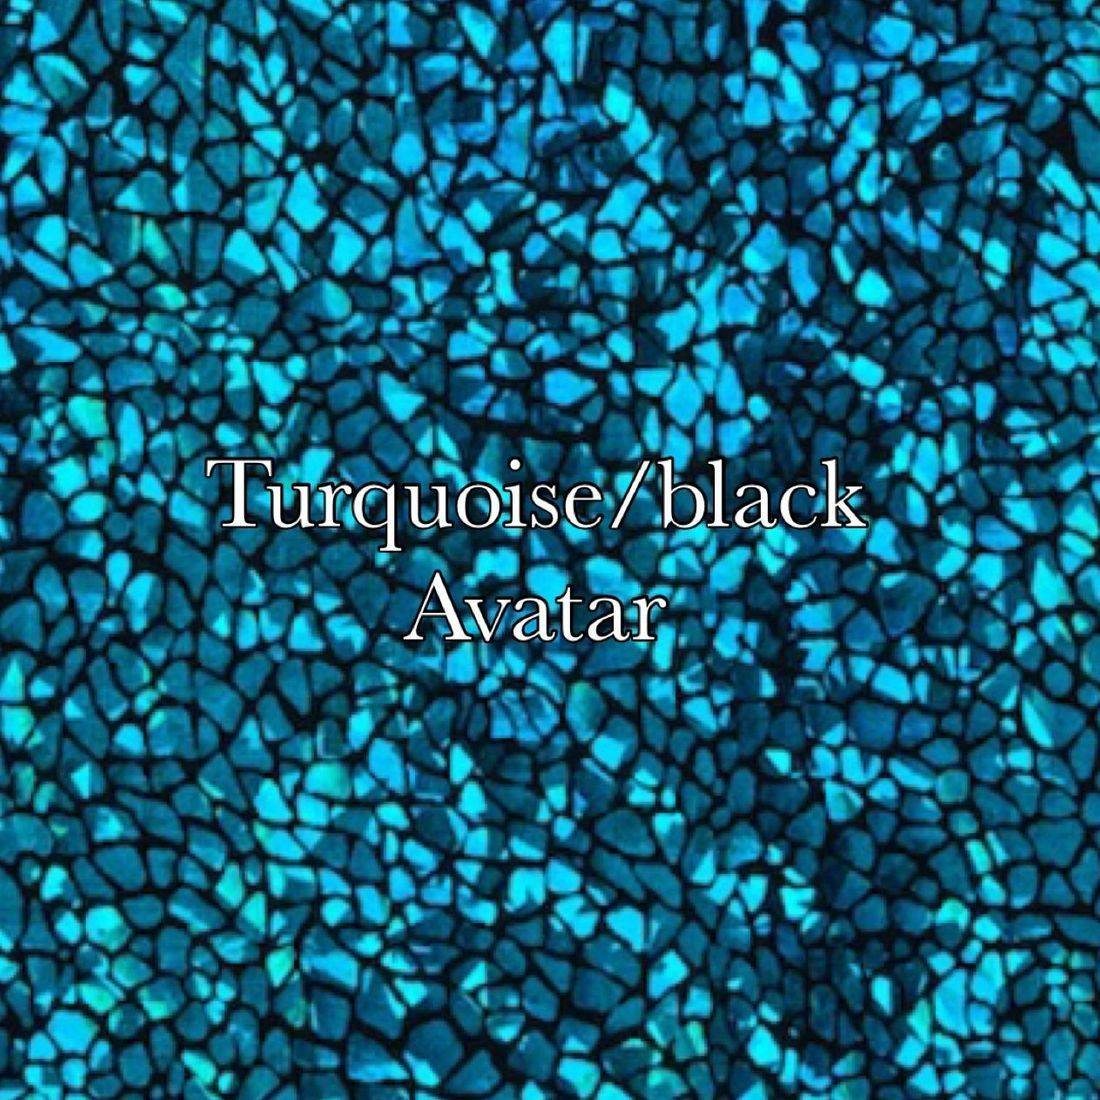 Turquoise black avatar